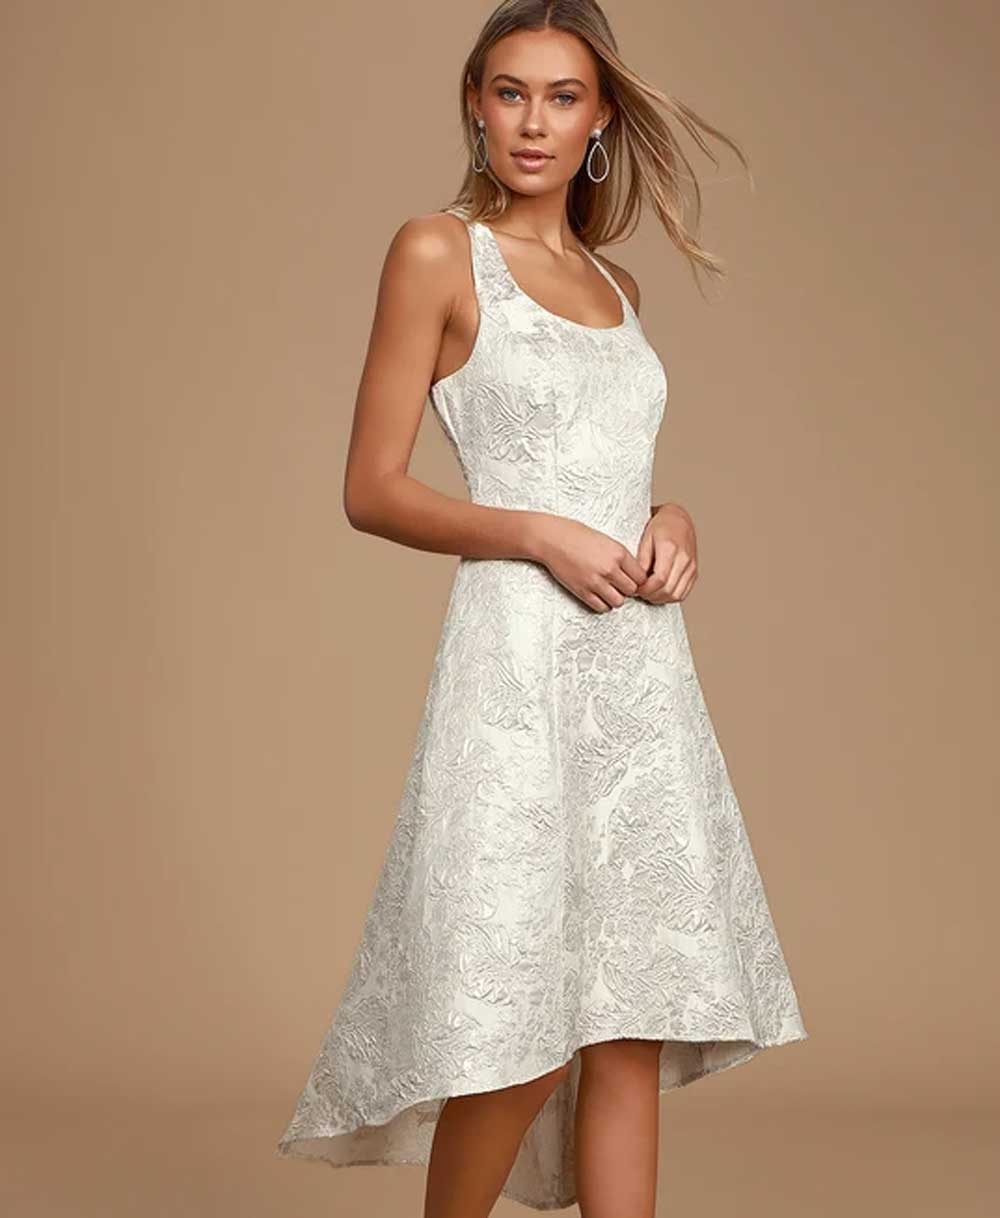 Vestido elegante para niña blanco